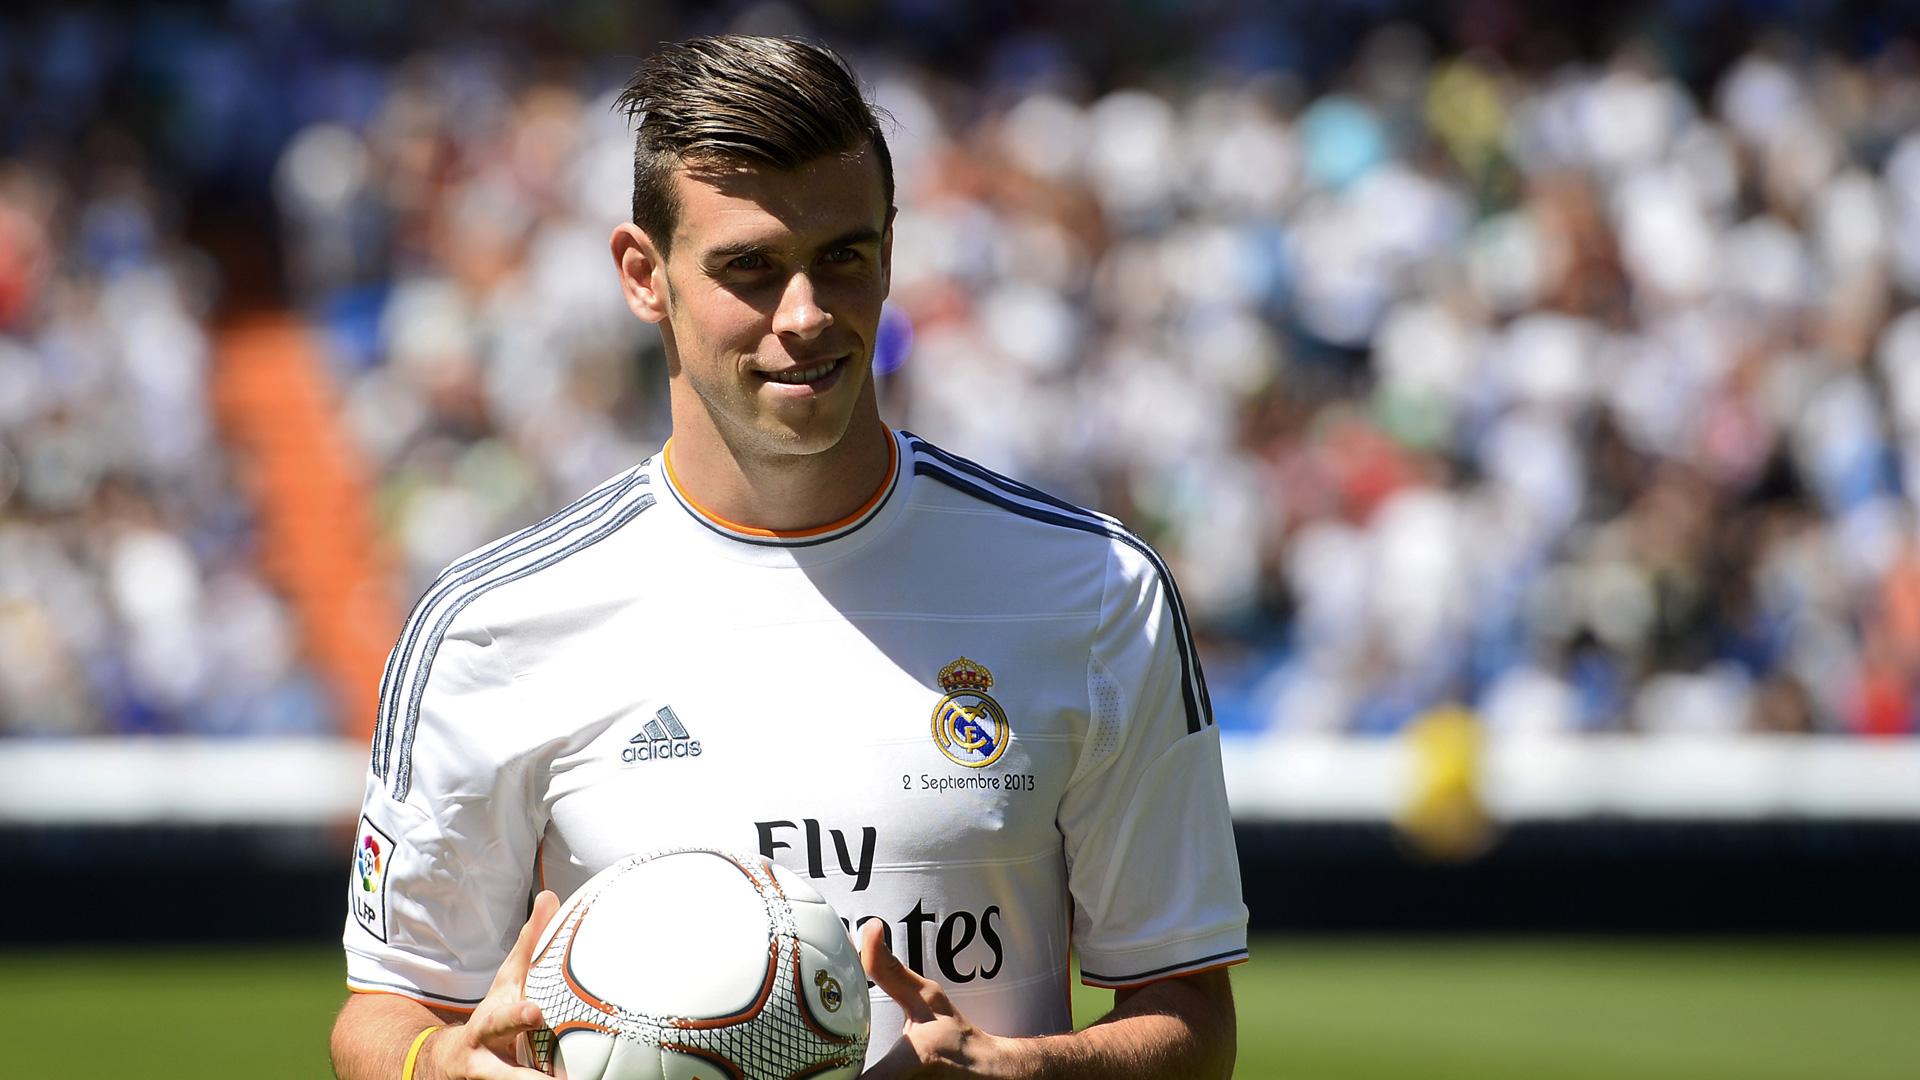 Gareth Bale Real Madrid 02092013